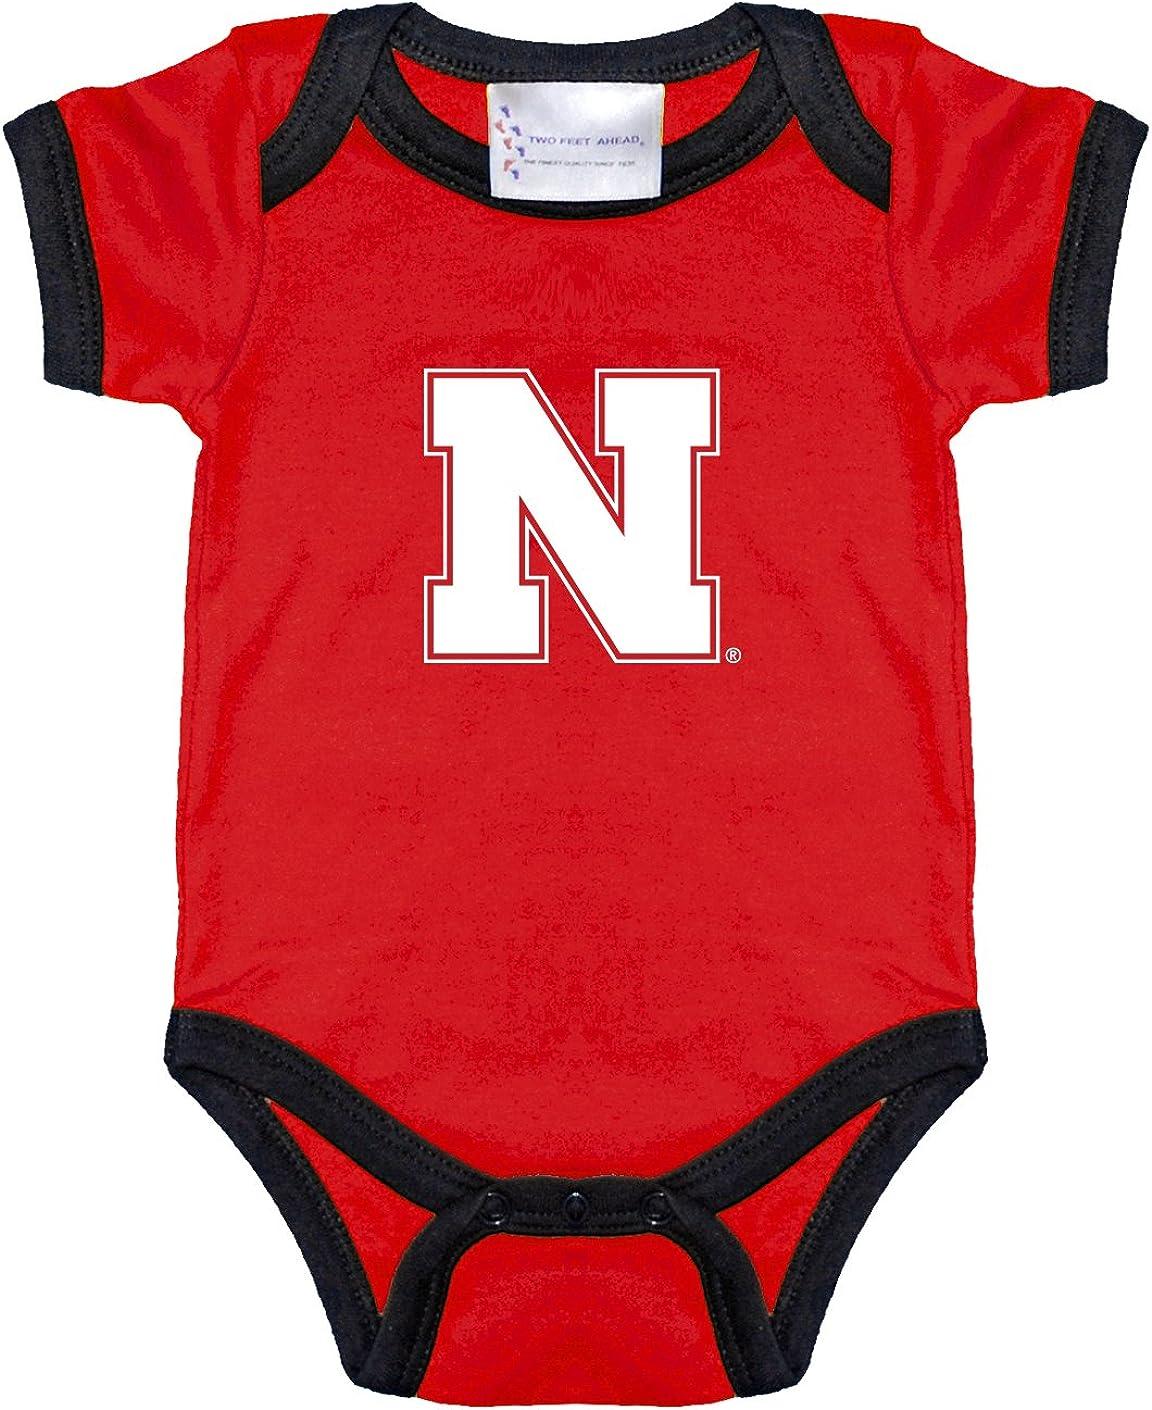 Nebraska Cornhuskers Two Tone NCAA College Newborn Infant Baby Creeper